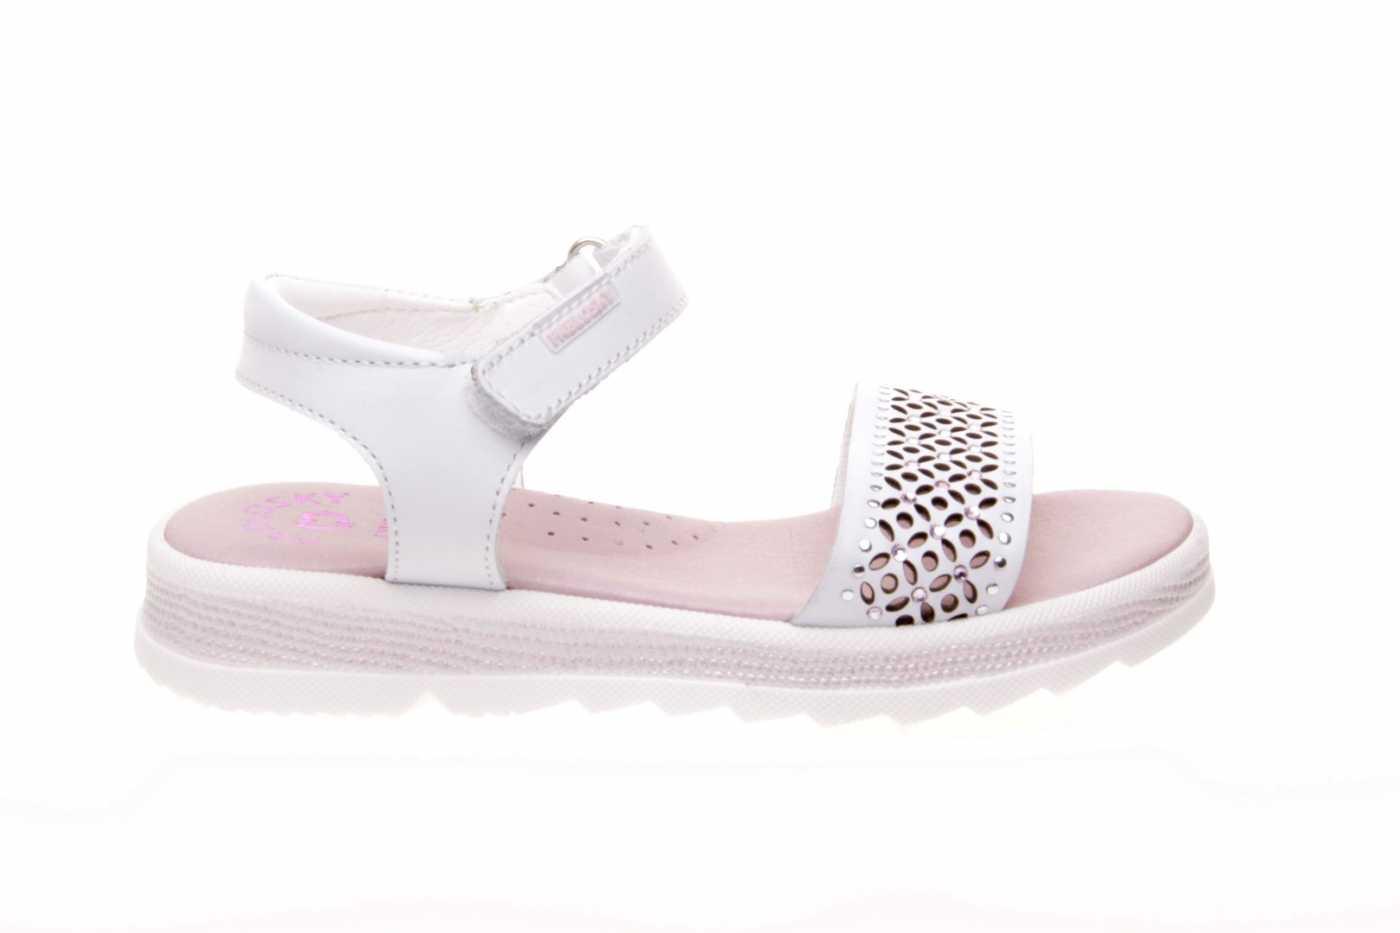 Sandalia Tipo Blanco Comprar Color Niña Zapato Joven Estilo Piel lFJTK1c3